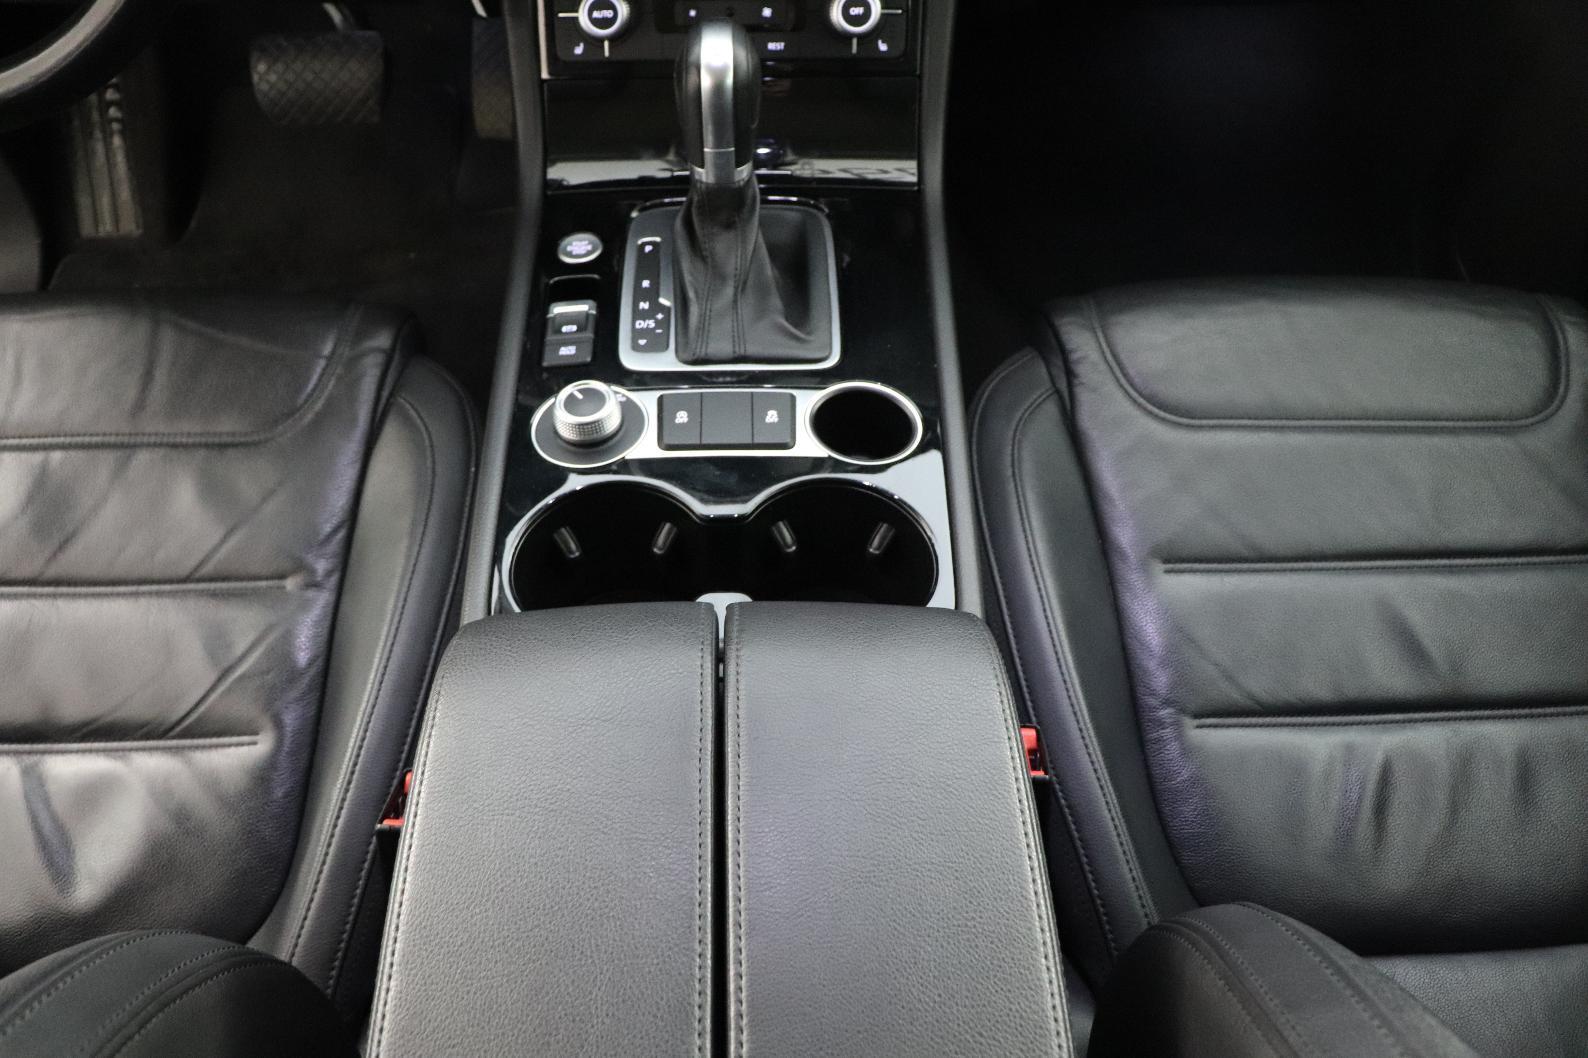 VOLKSWAGEN TOUAREG 3.0 V6 TDI 204 4Motion BlueMotion Technology Carat Edition A